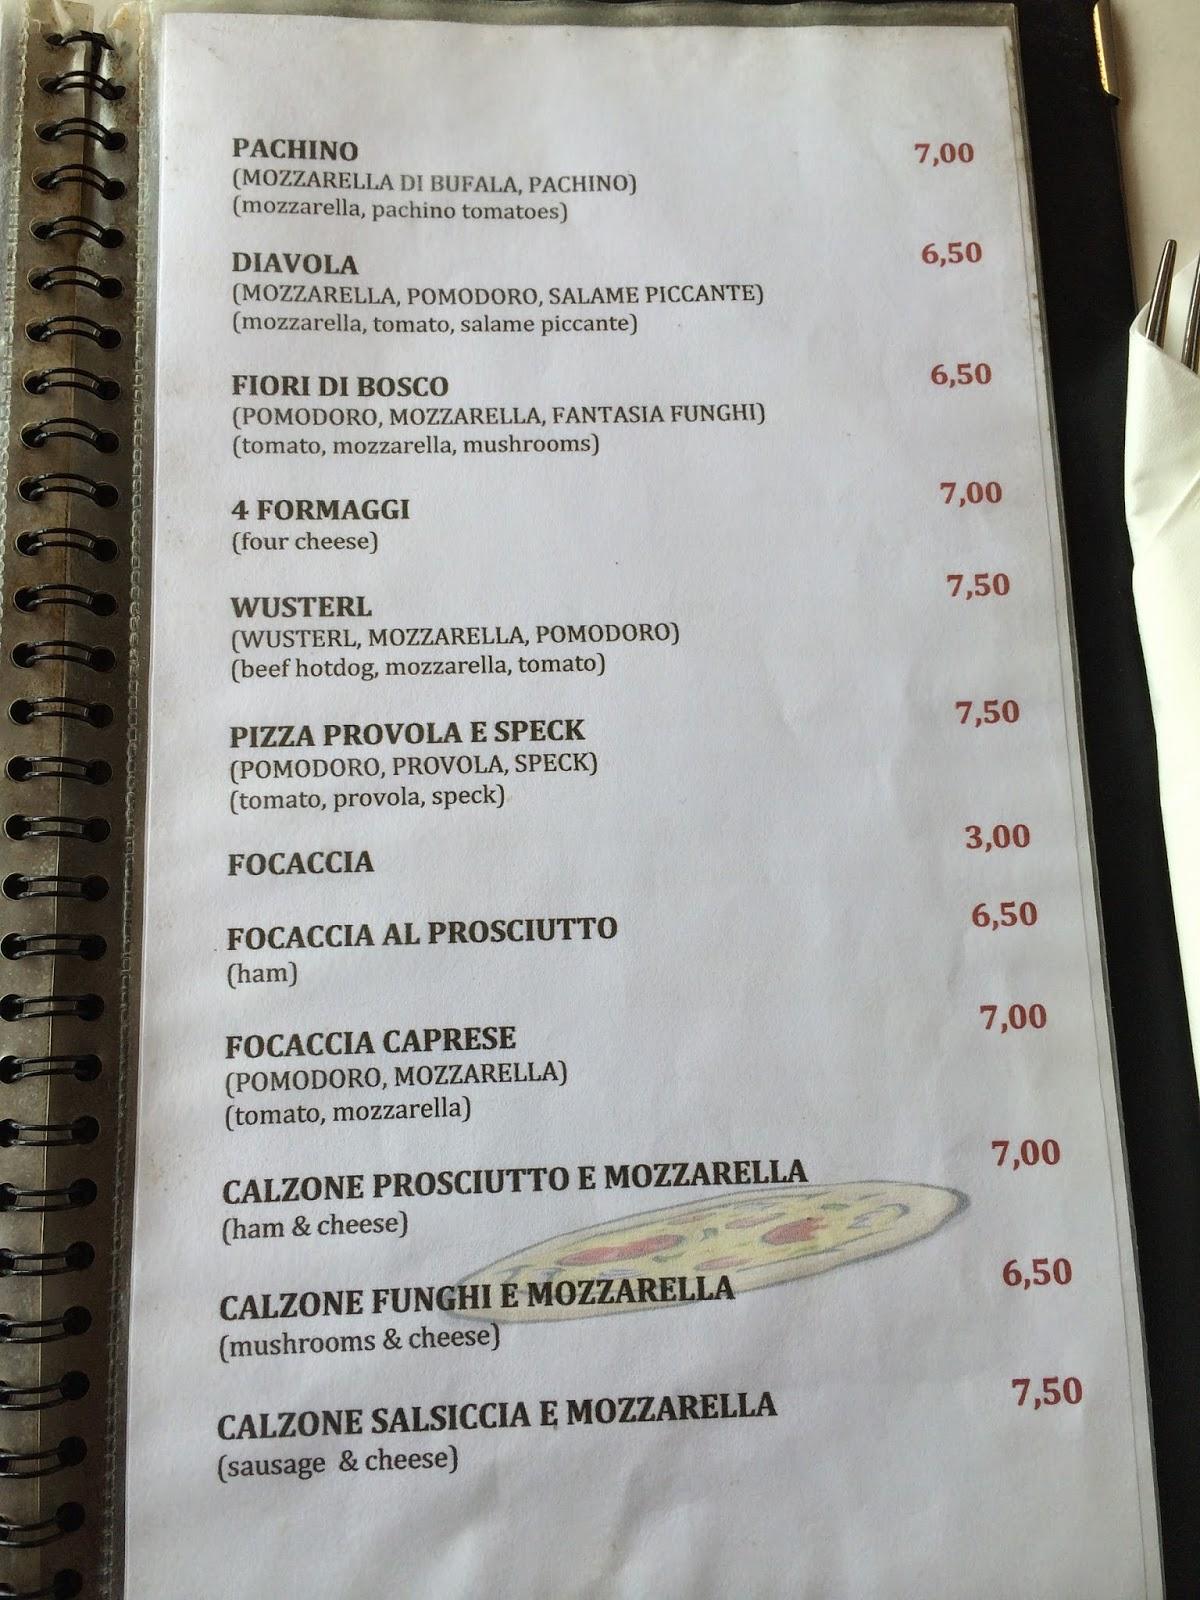 Taste of hawaii da franco all aventino rome italy more pizza and calzones aiddatafo Gallery